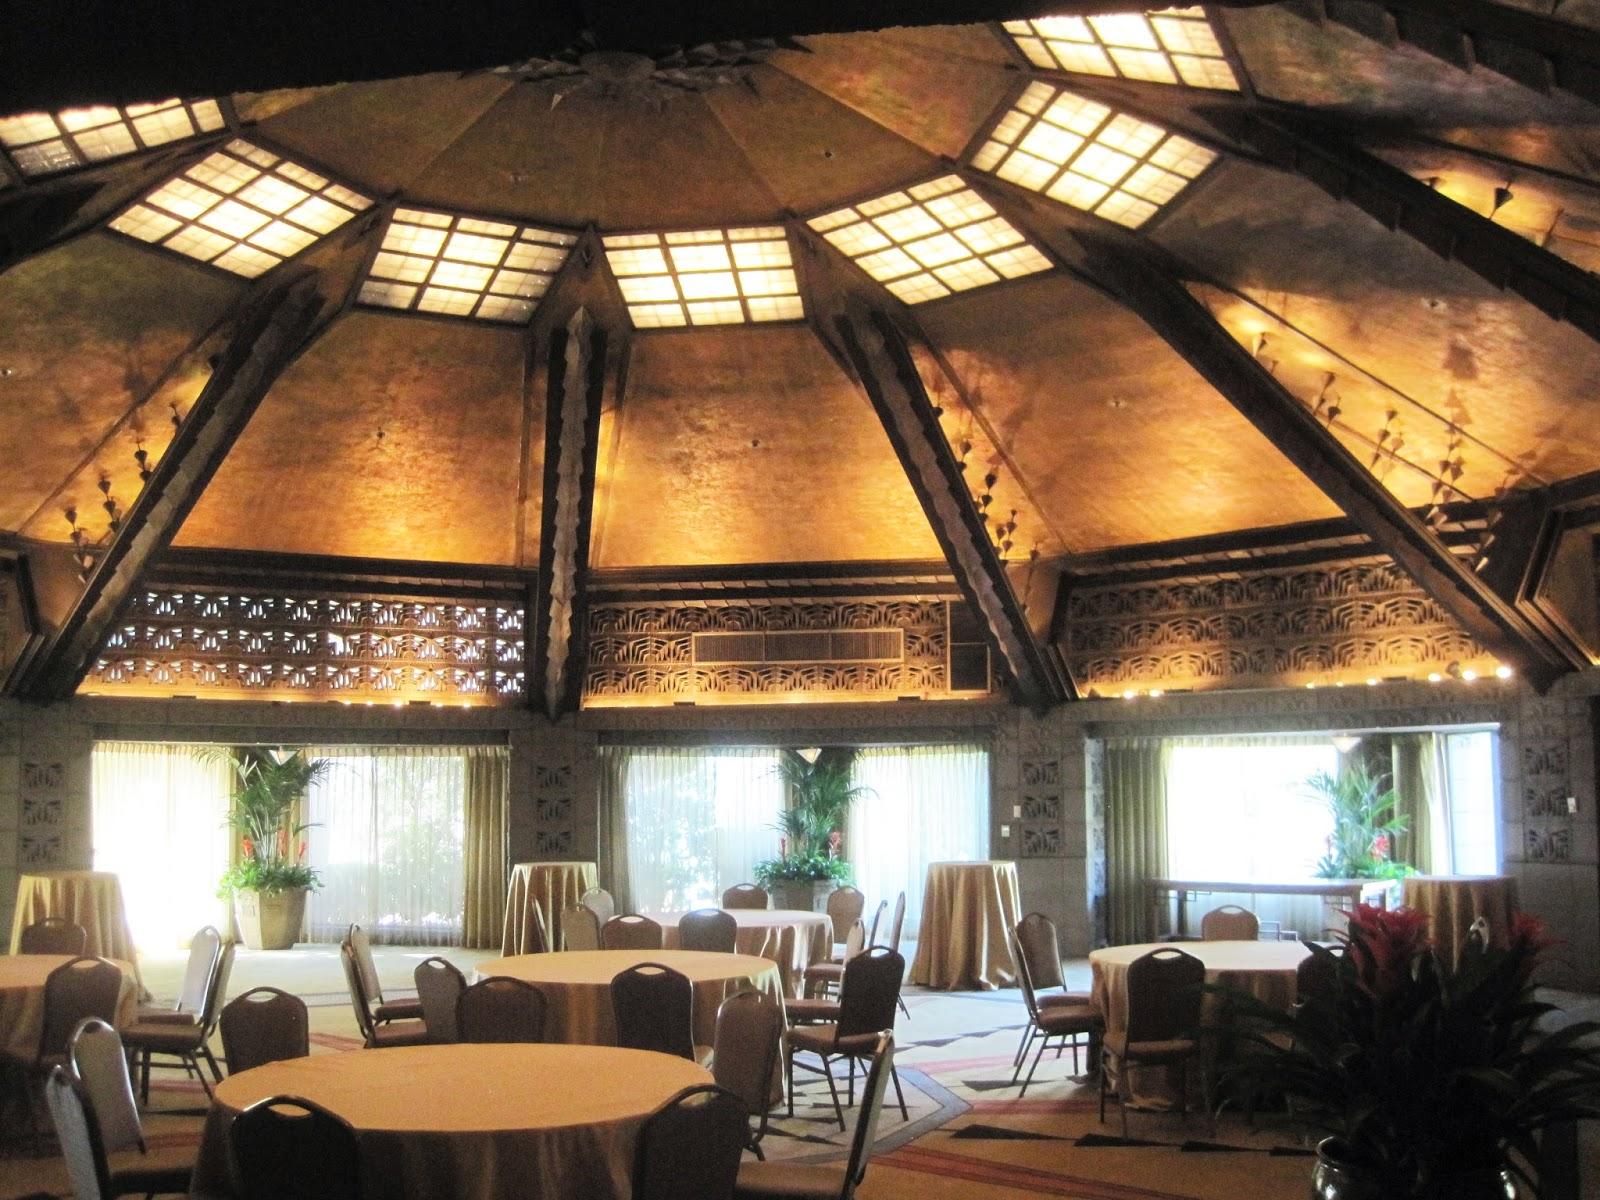 architect design public spaces of the biltmore hotel arizona